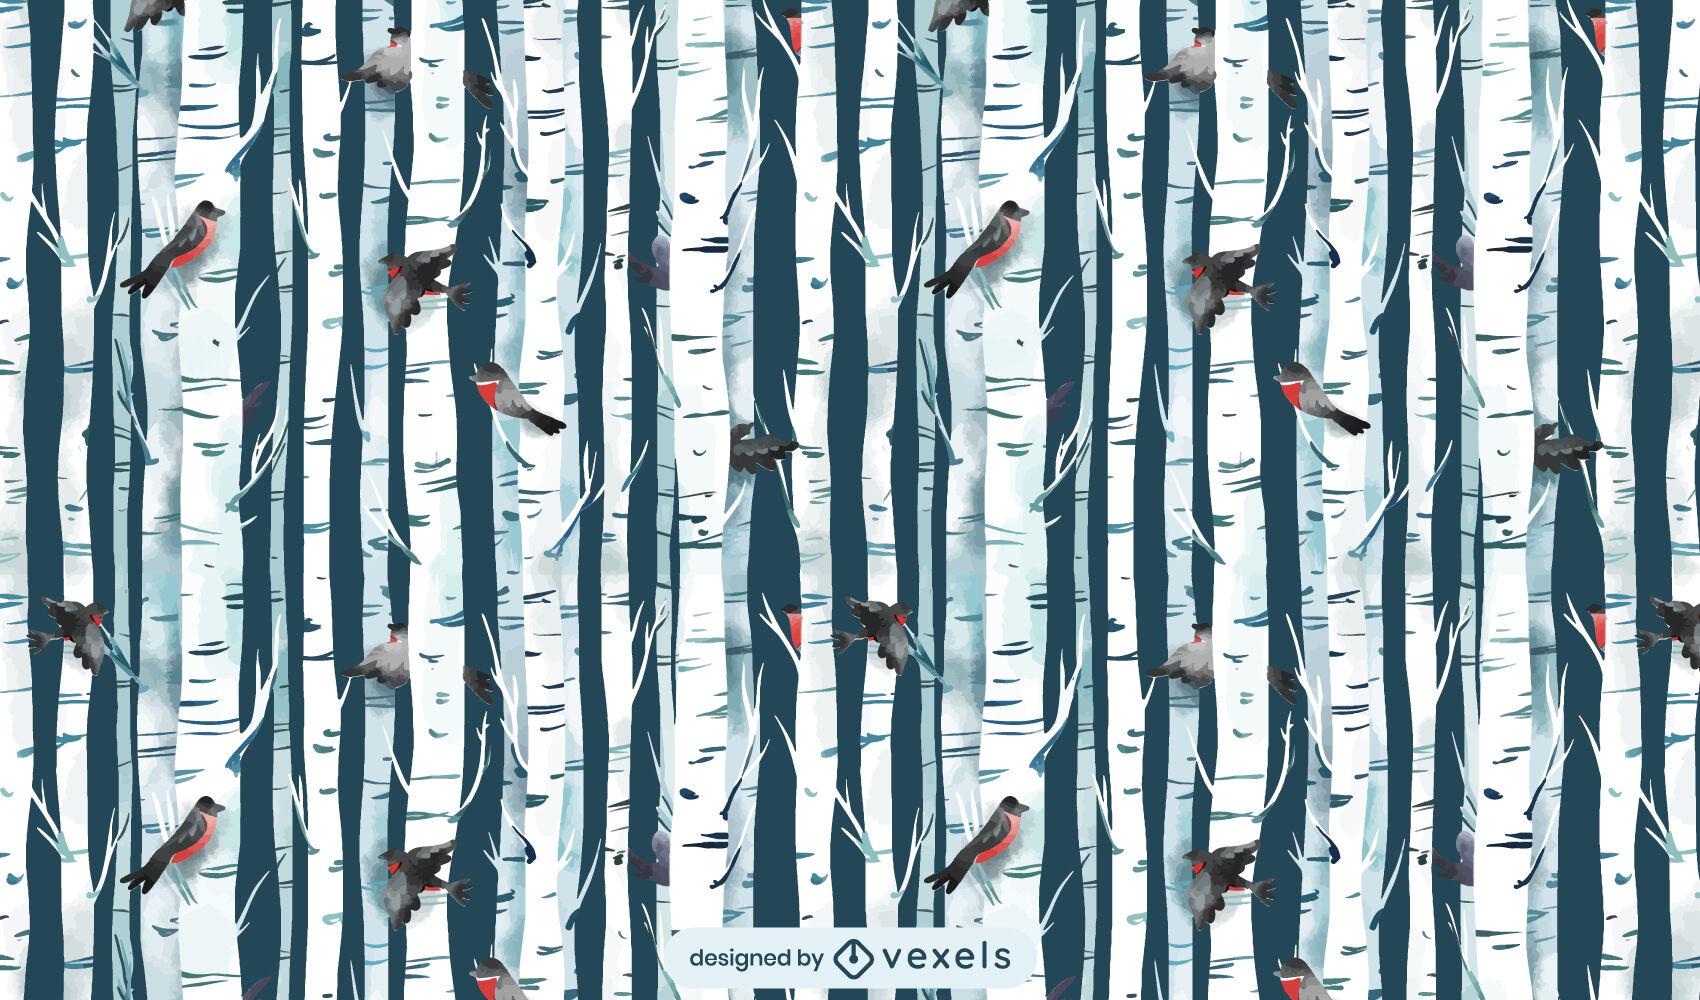 Winter forest with birds pattern design